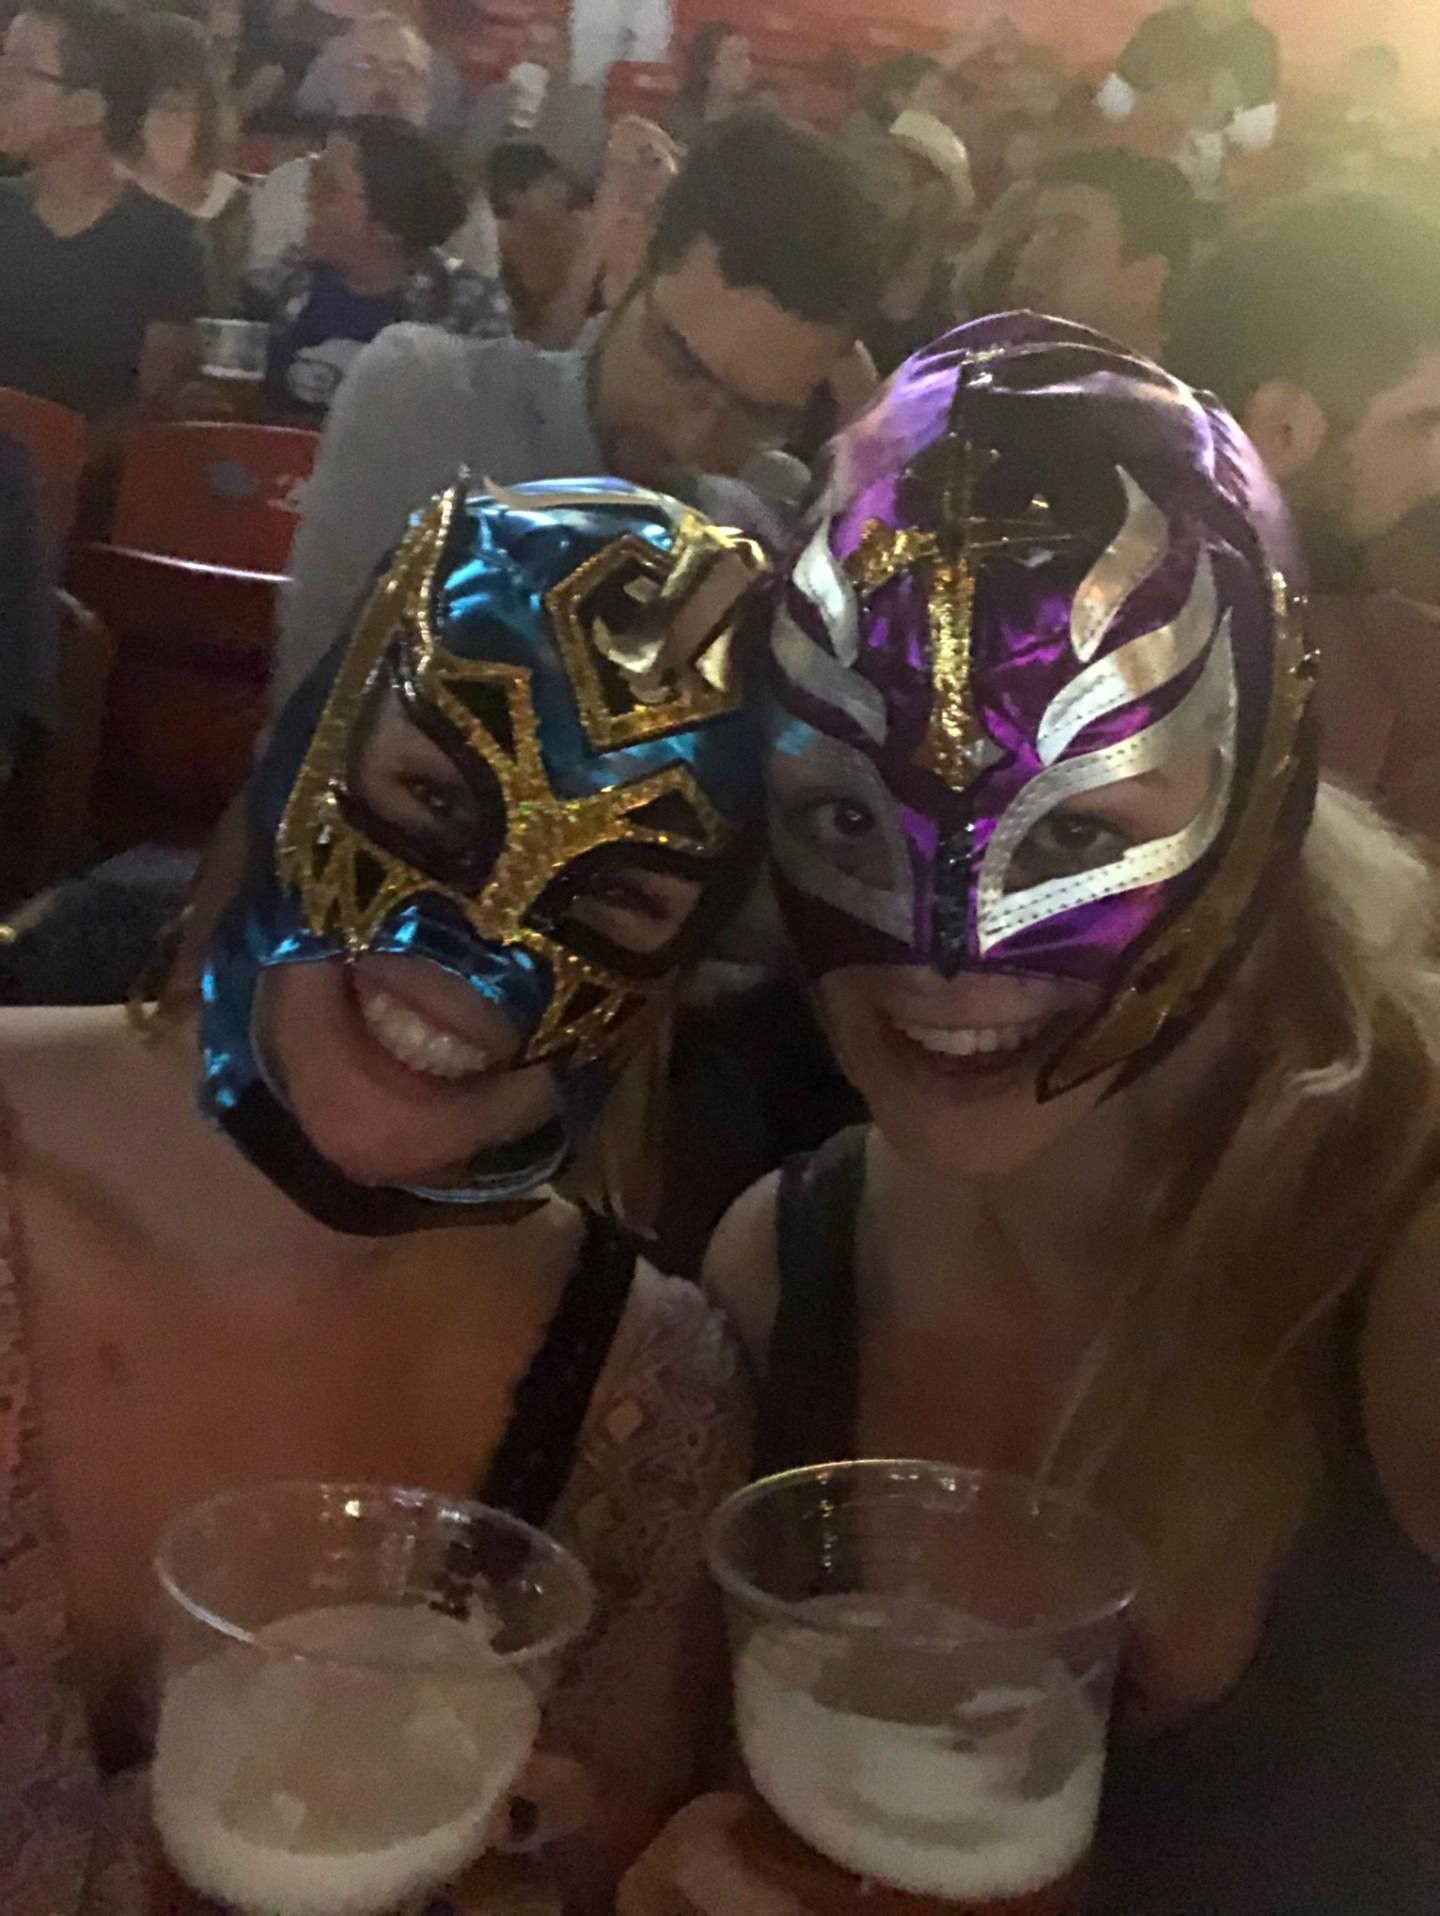 Girls in lucha libre masks